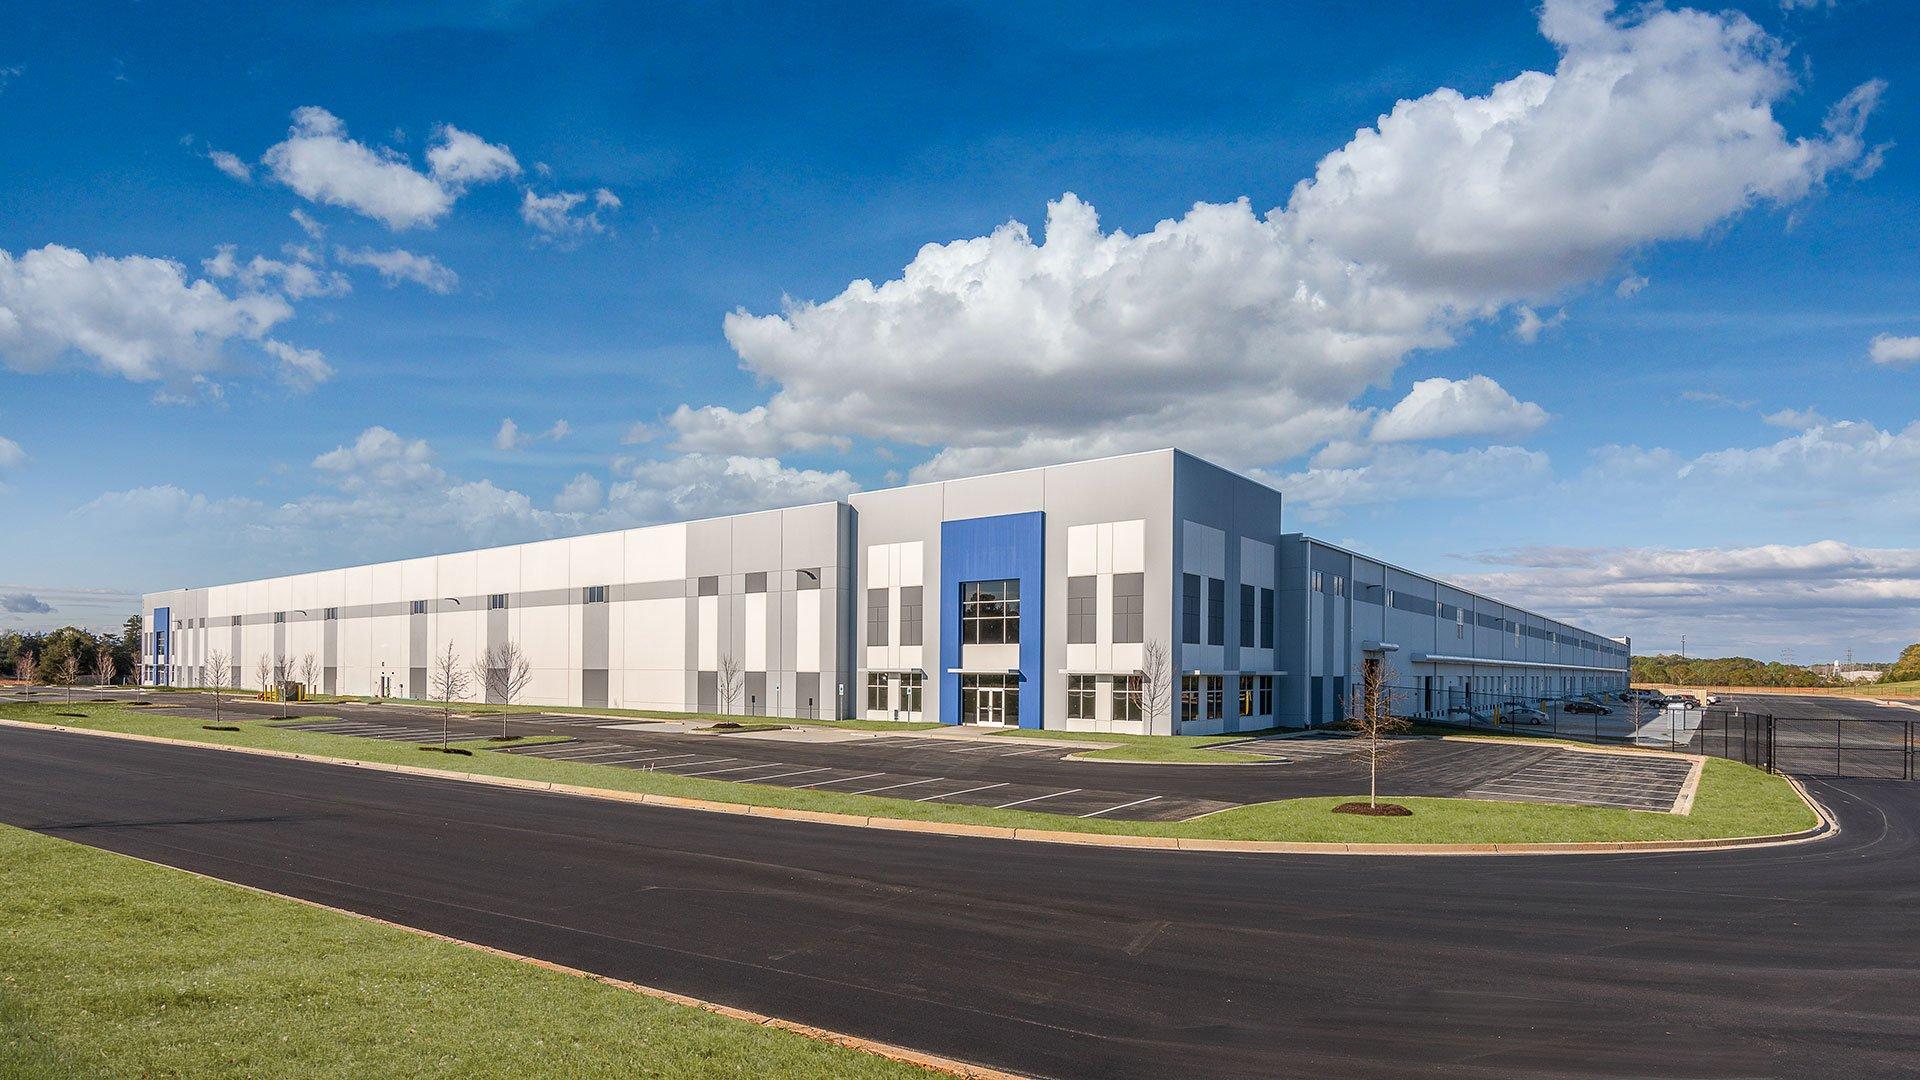 Clarius Park Inland Port Greer Spec Distribution Center